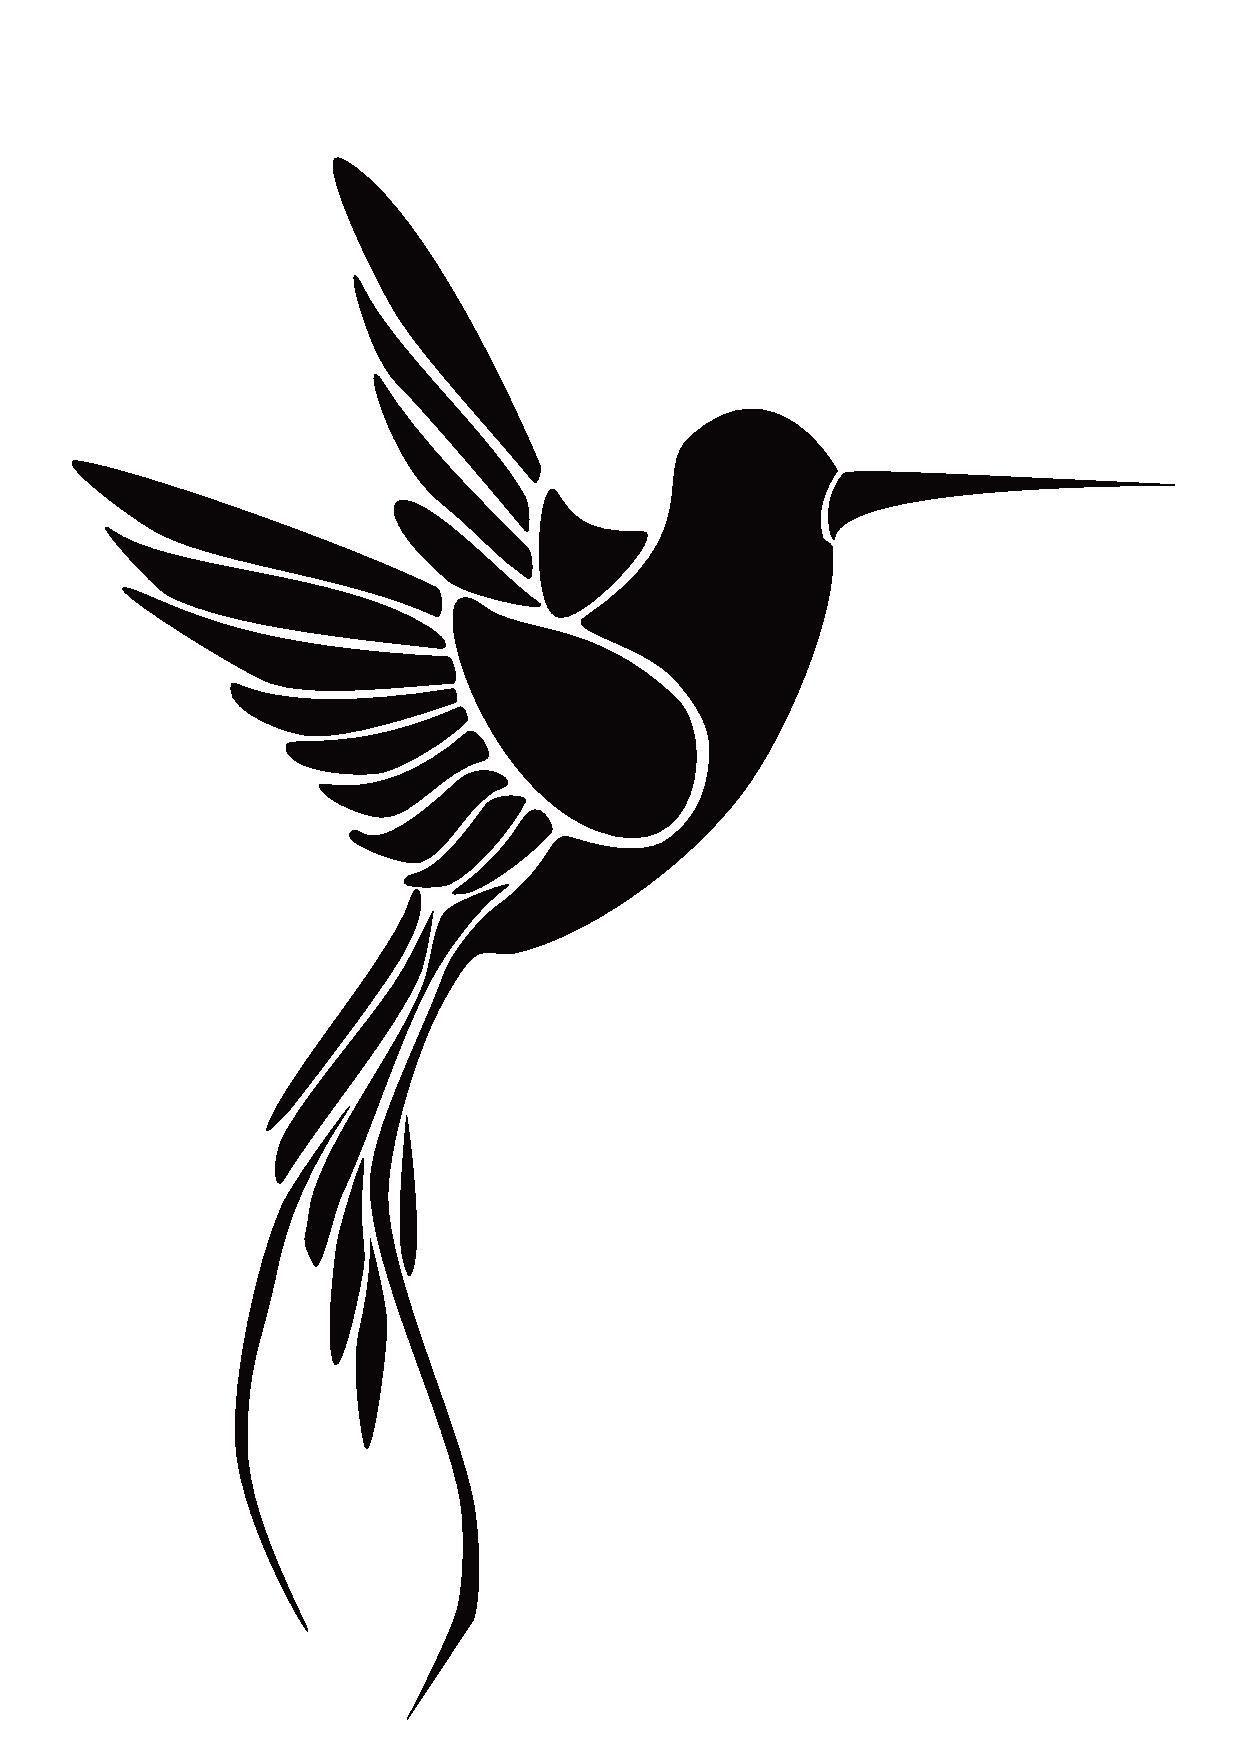 Pin By Divyansha Malhotra On Fabric Painting In 2020 Animal Stencil Stencil Printing Bird Stencil